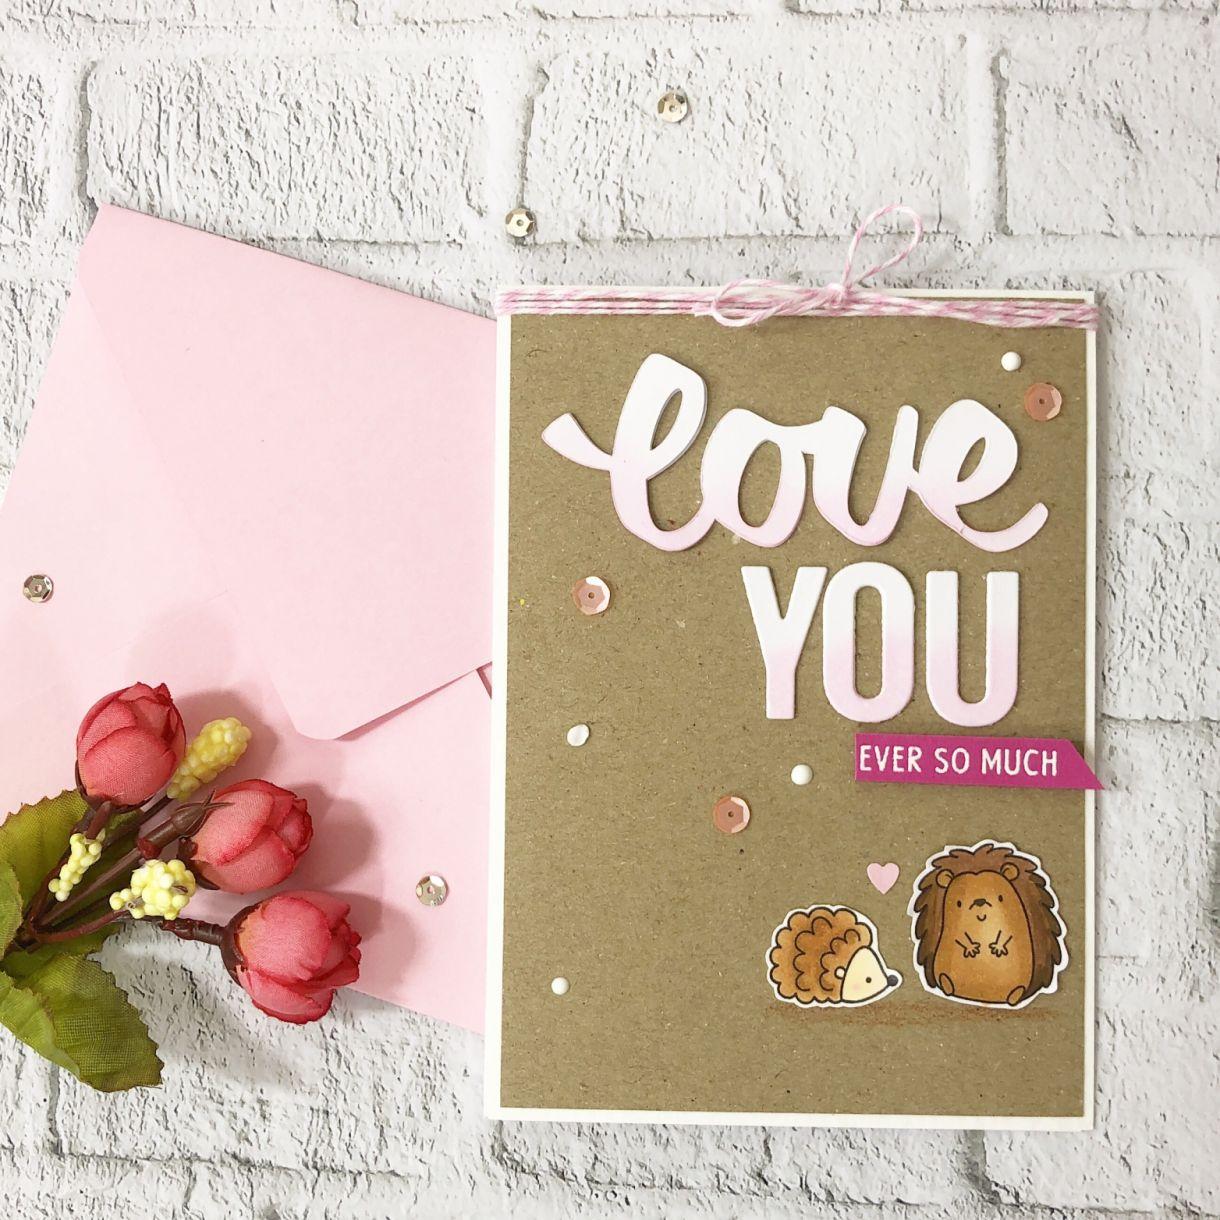 Loveyou1